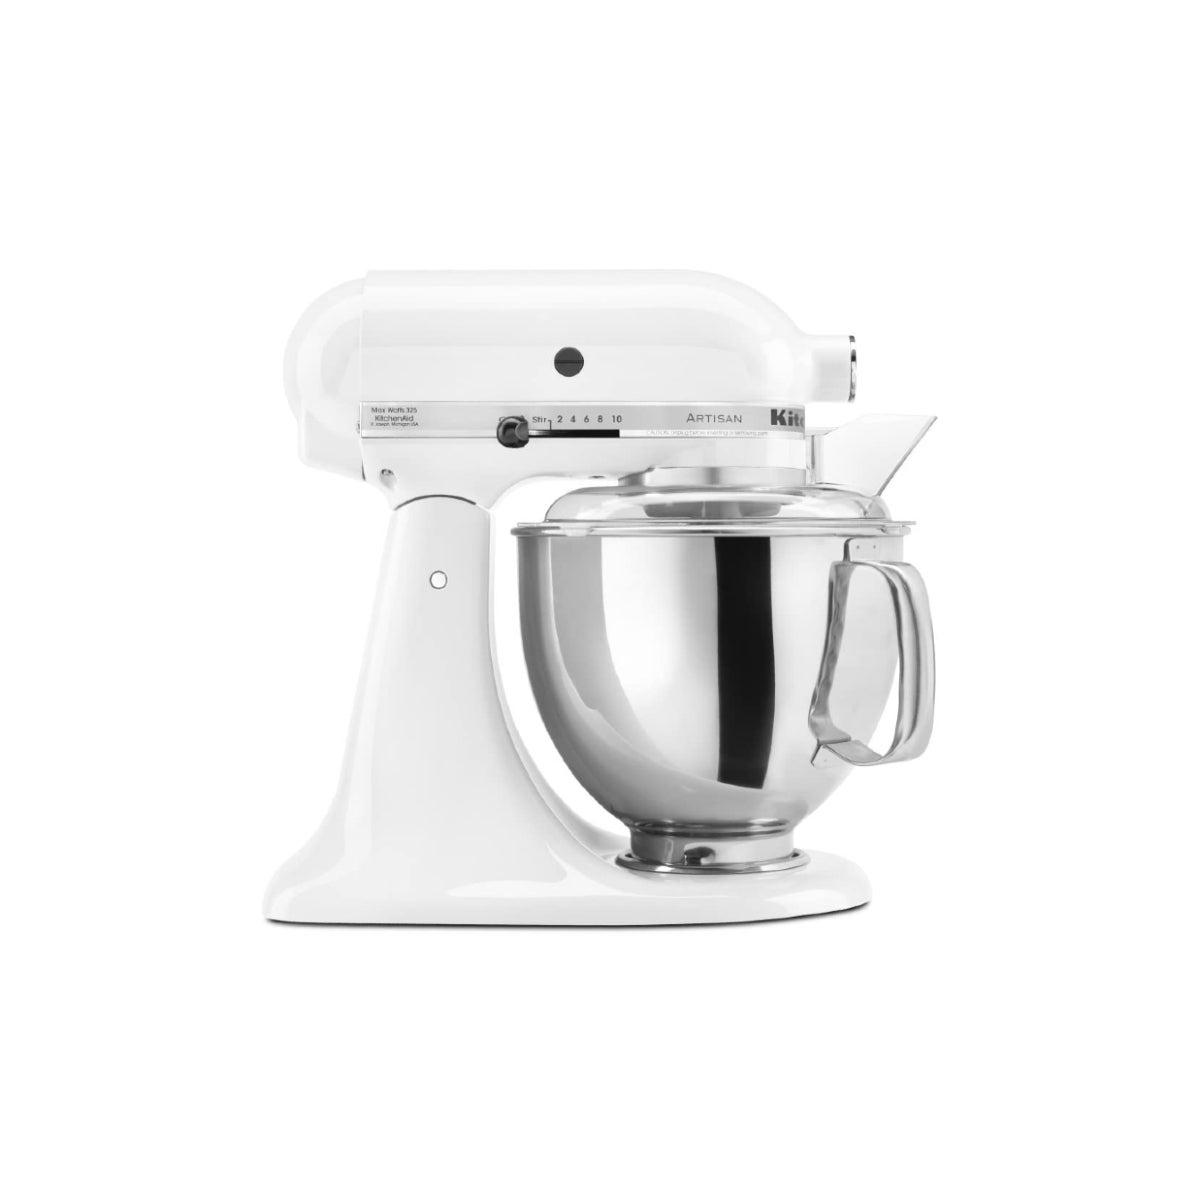 The Best KithcenAid-Mixer Option KitchenAid Artisan 5-Quart